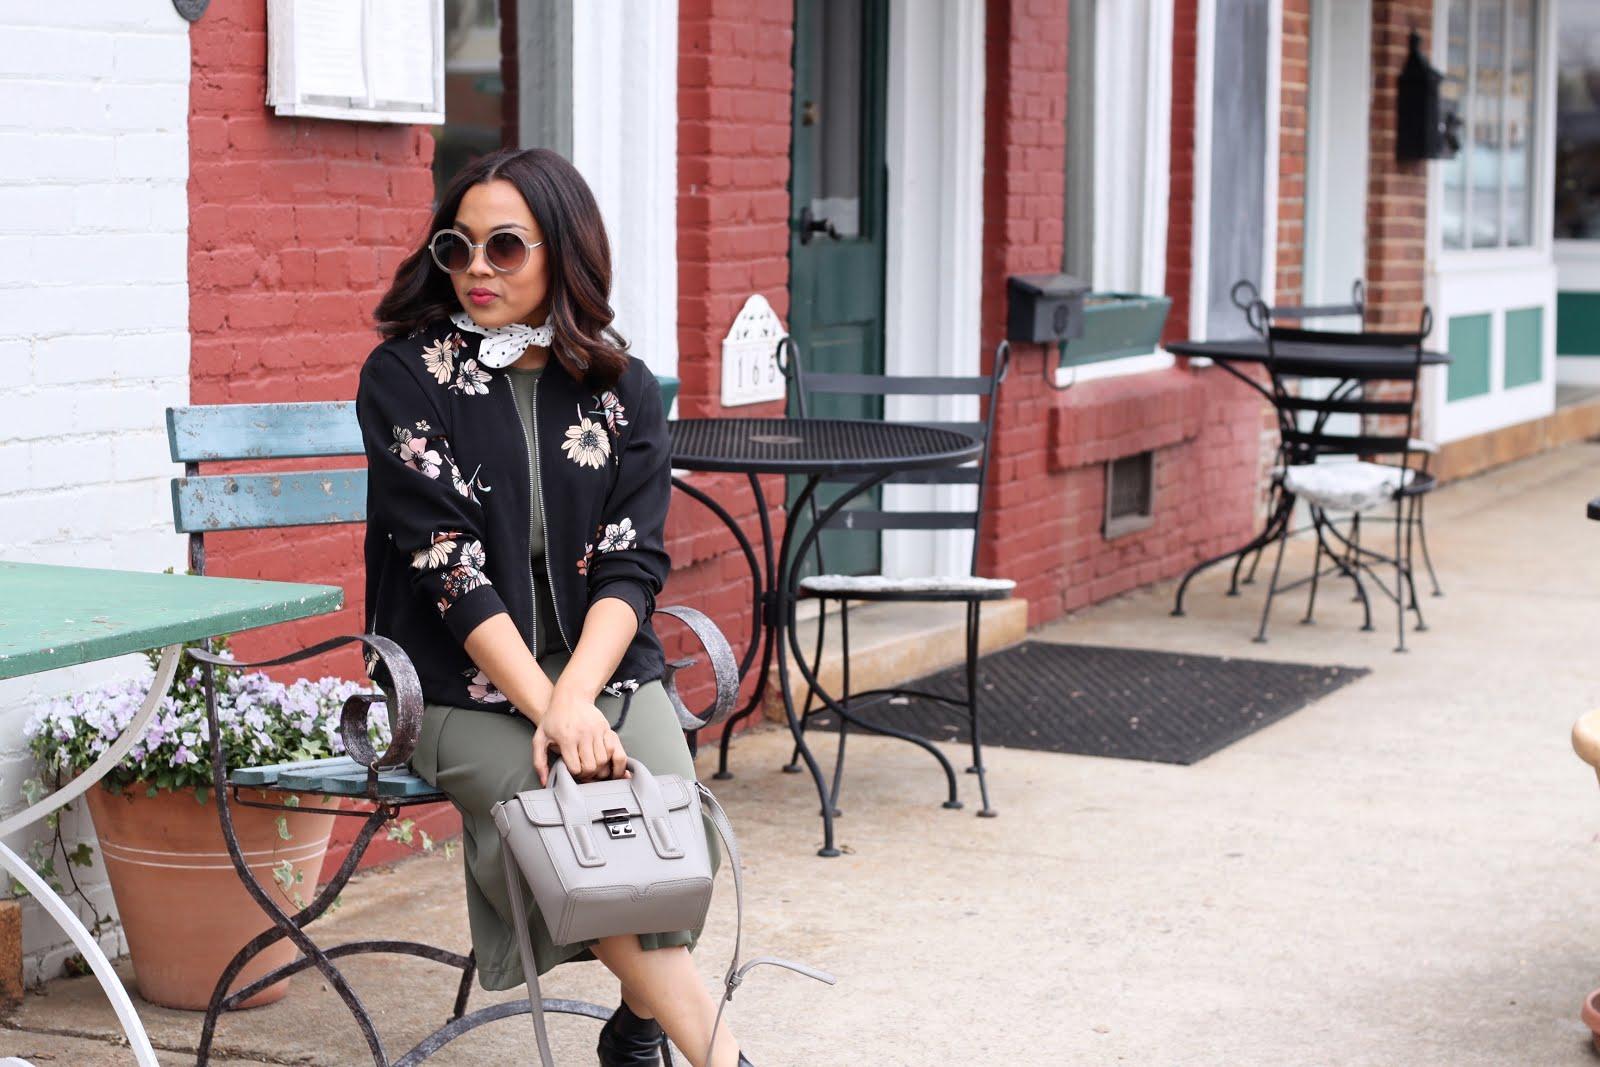 ad3cbf57056a7 Floral Bomber: Who What Wear via Target. Olive Green Midi Dress: Who What  Wear via Target. Gray Minibag: Marshalls. Polka Dot Ascot Scarf: Who What  Wear via ...